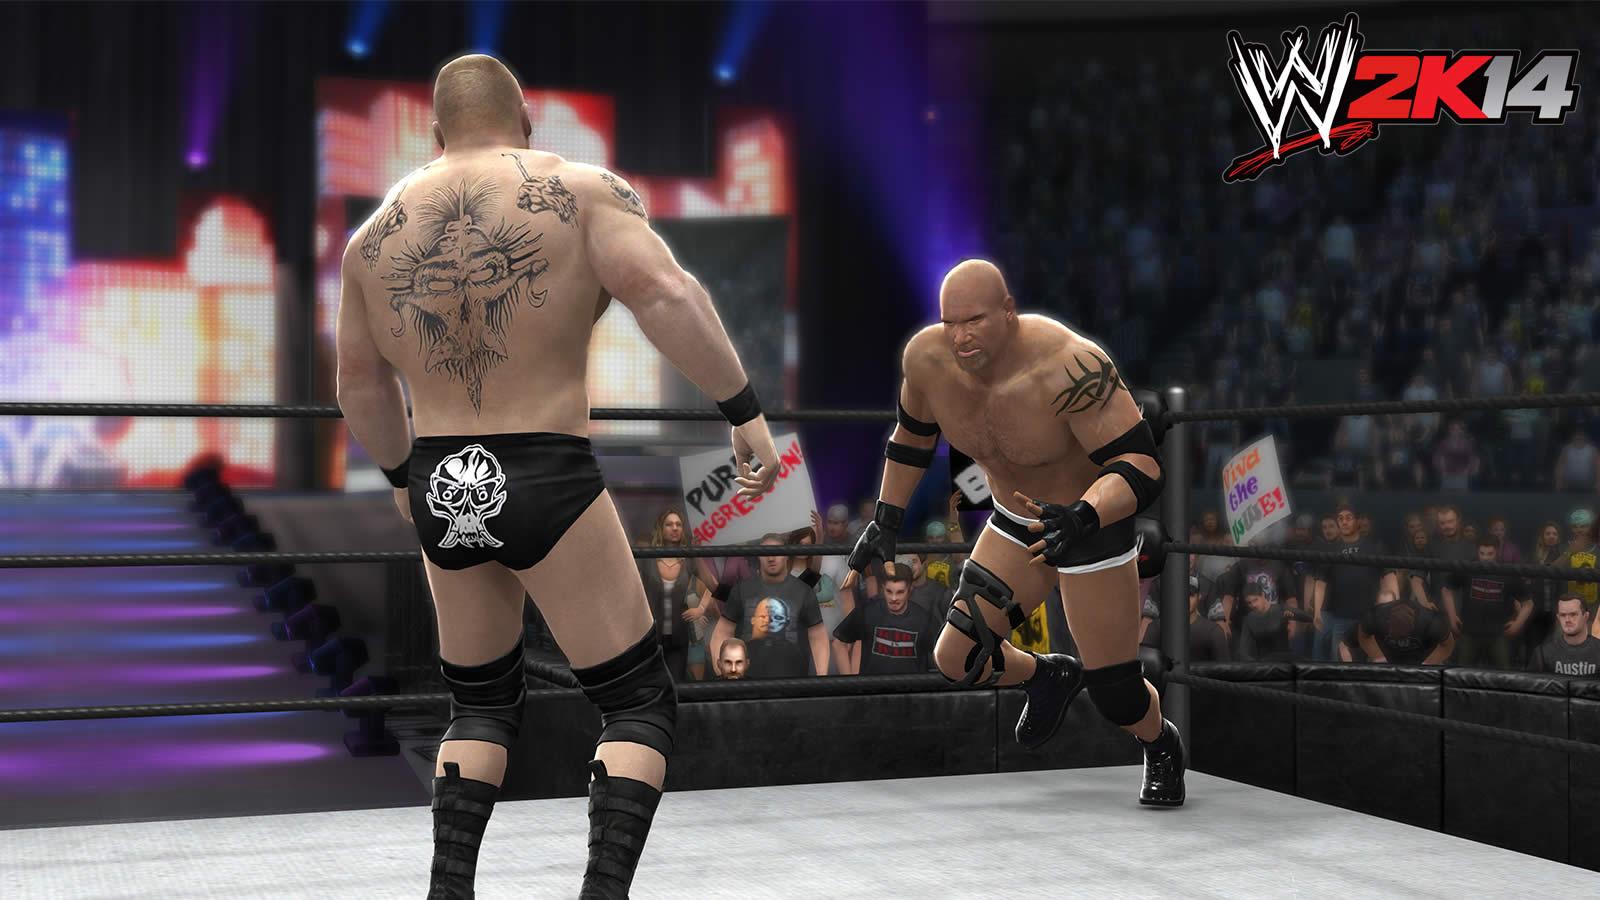 WWE 2K14 Screenshots WM20 Goldberg vs Brock Lesnar by ThexRealxBanksWwe 2k14 Screenshots Goldberg